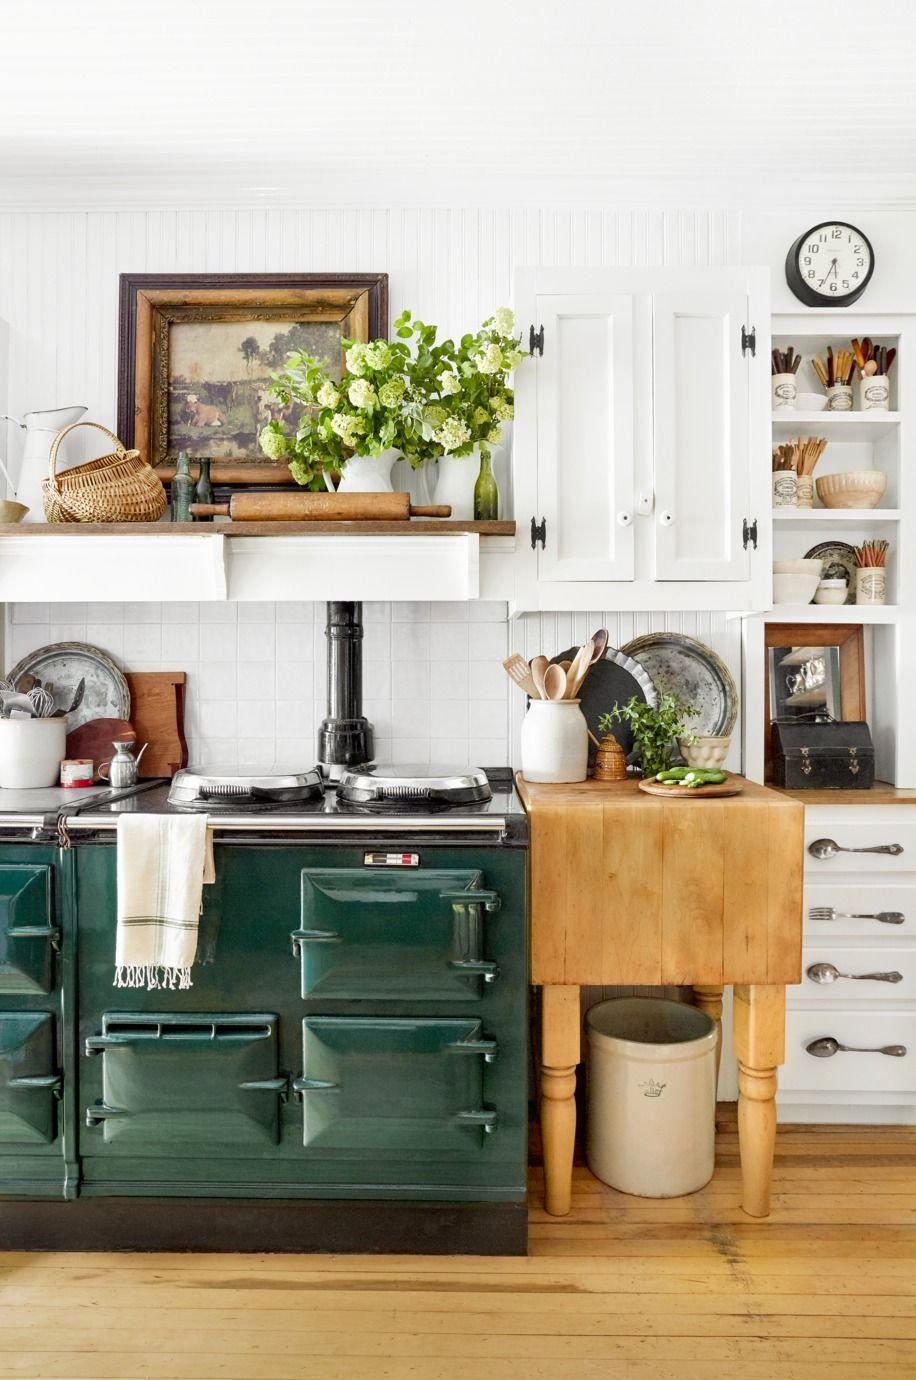 60 Best Farmhouse Style Ideas - Rustic Home Decor on Farmhouse Rustic Kitchen Ideas  id=53777